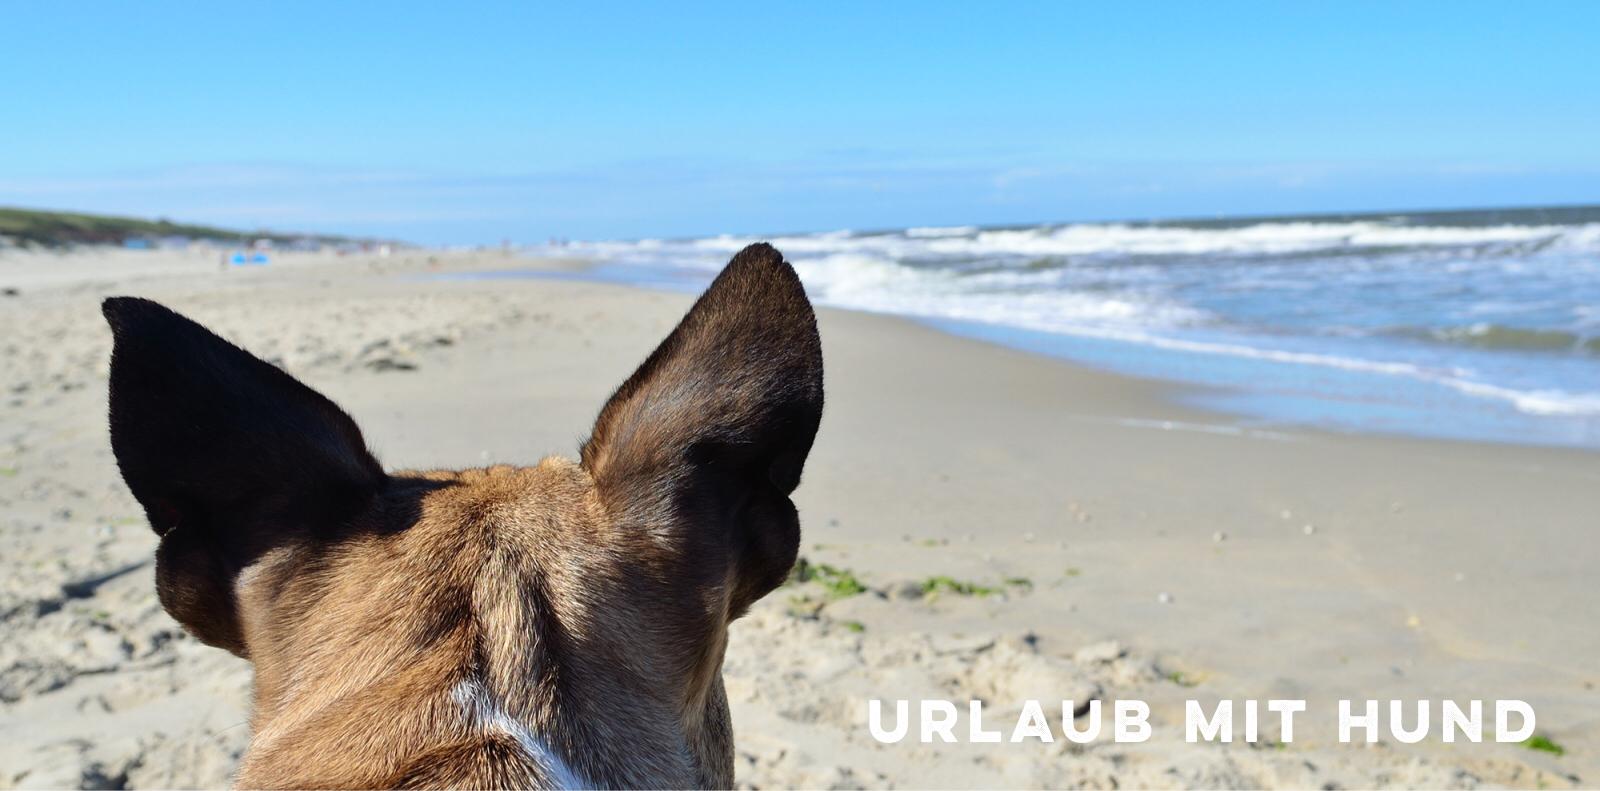 Urlaub mit Hund miDoggy